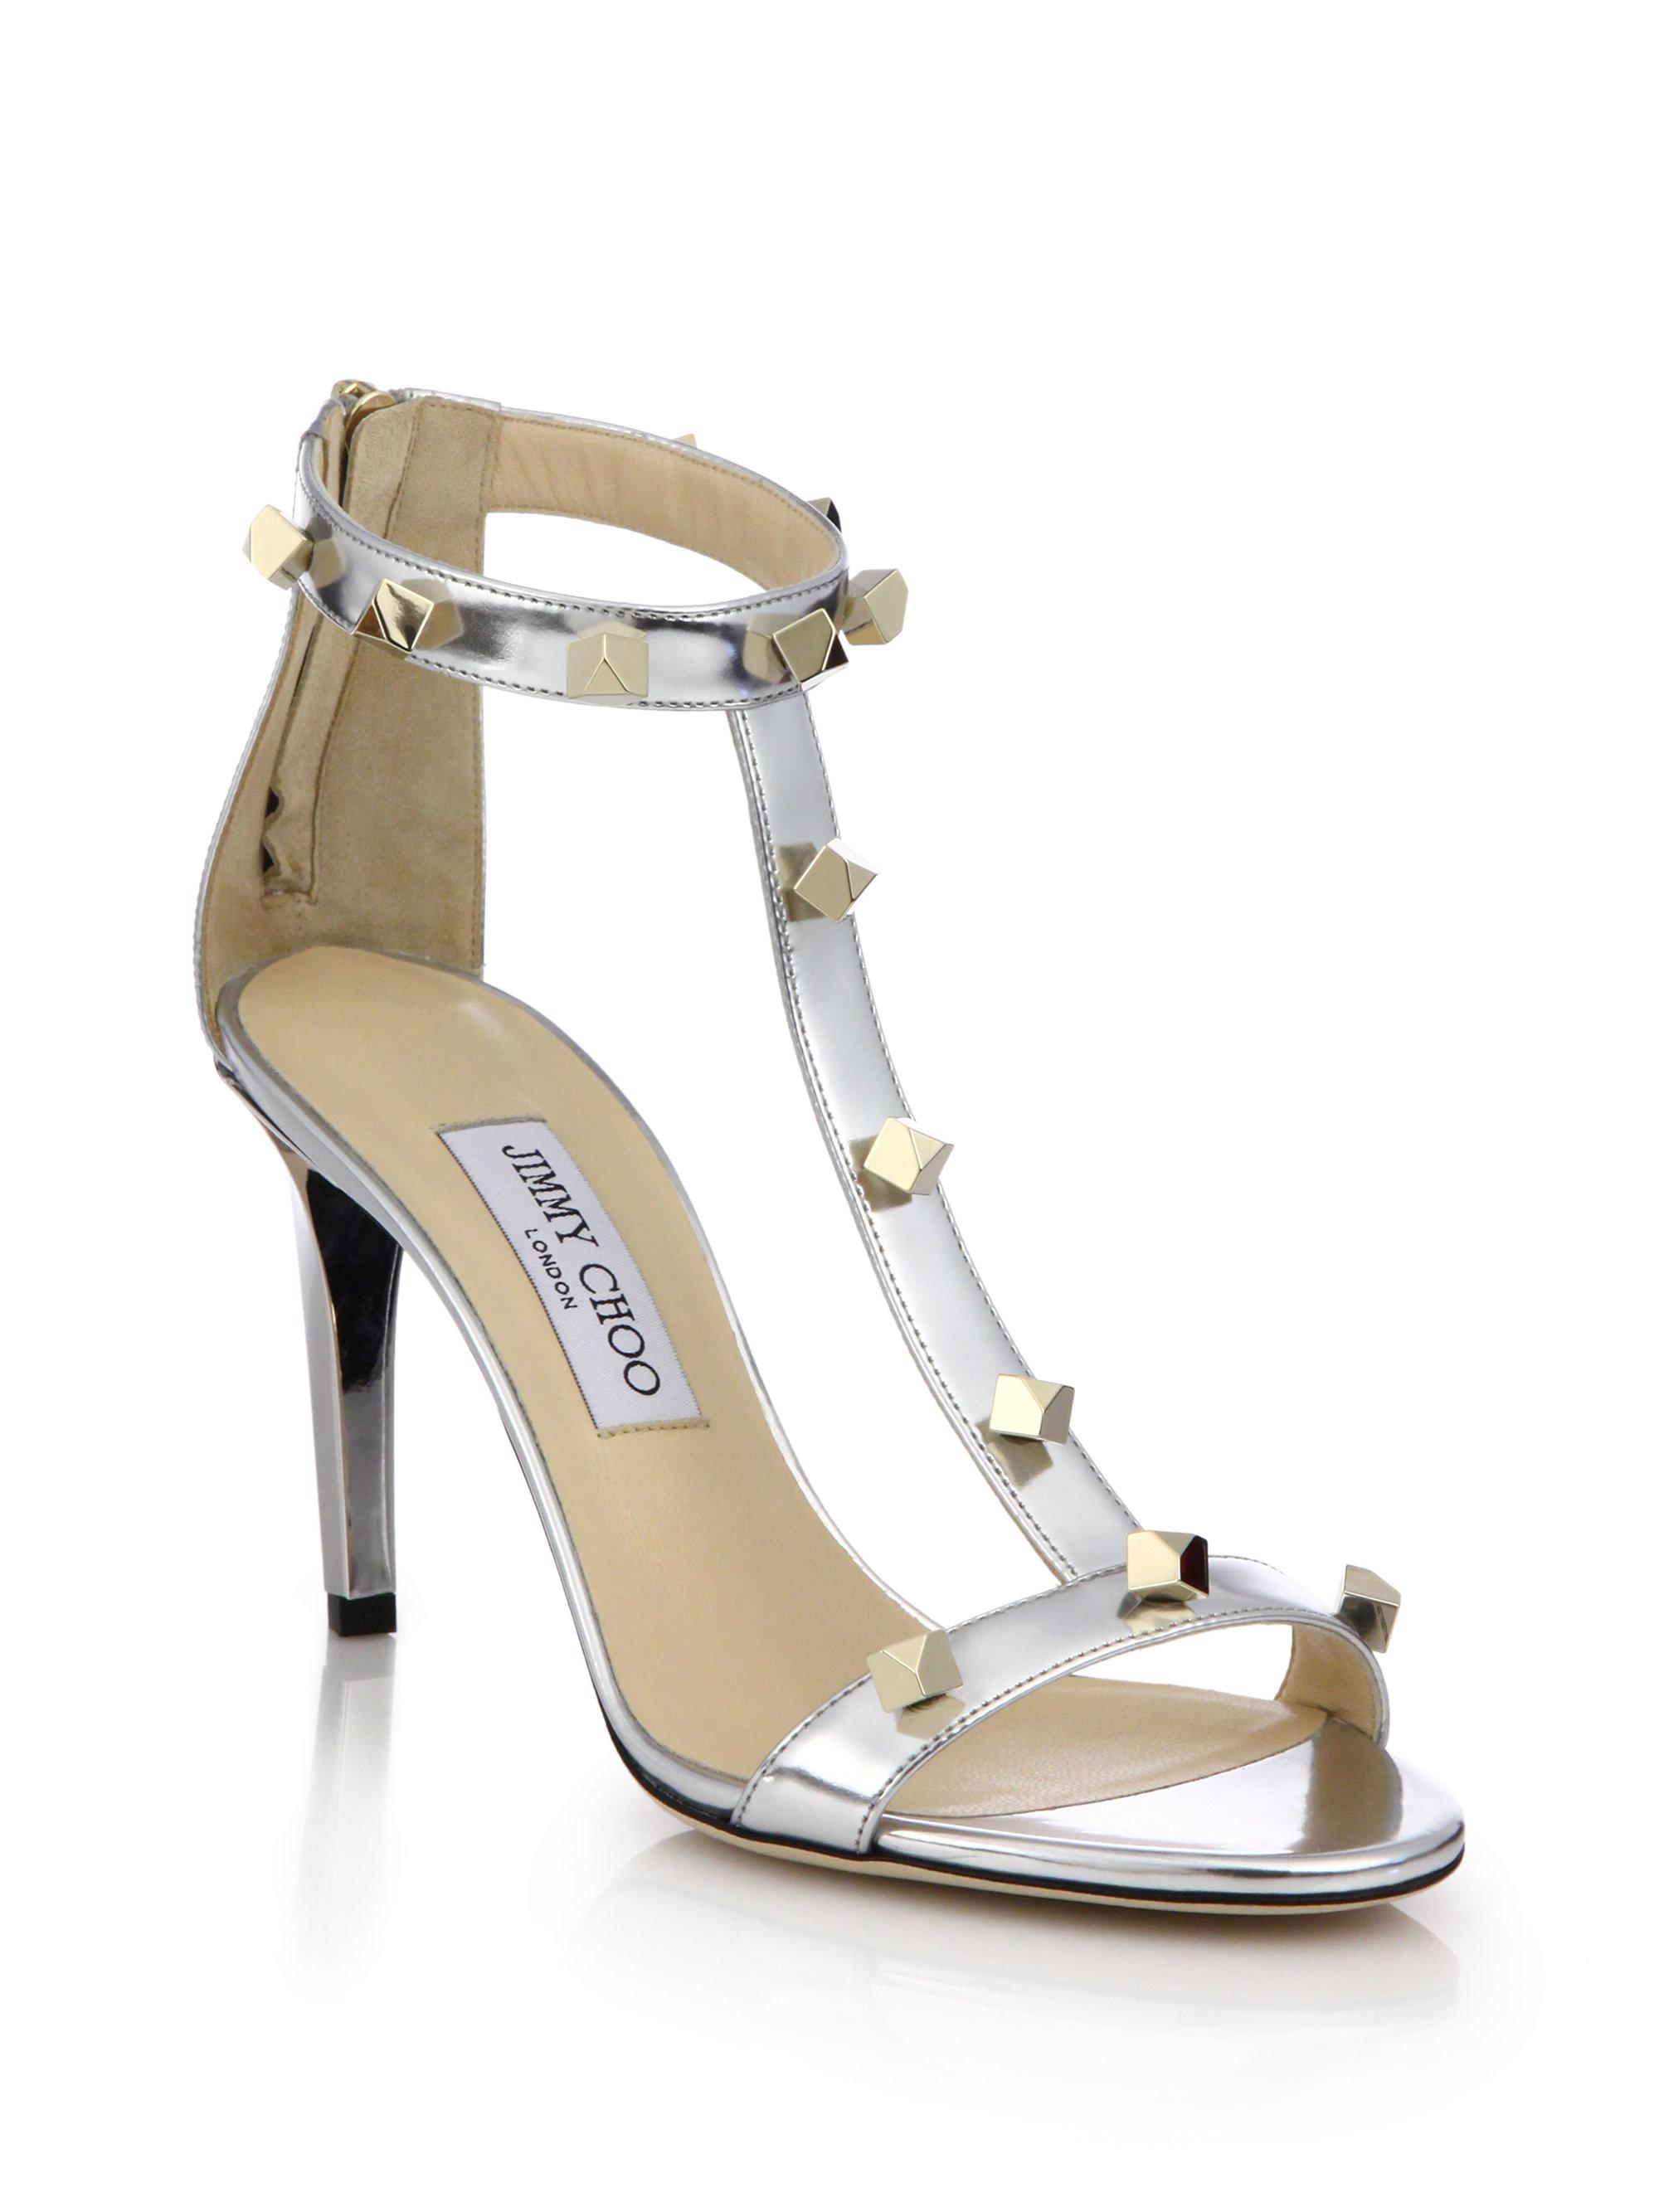 f8e73513c2d Lyst - Jimmy Choo Lamba Studded Metallic Leather Sandals in Metallic